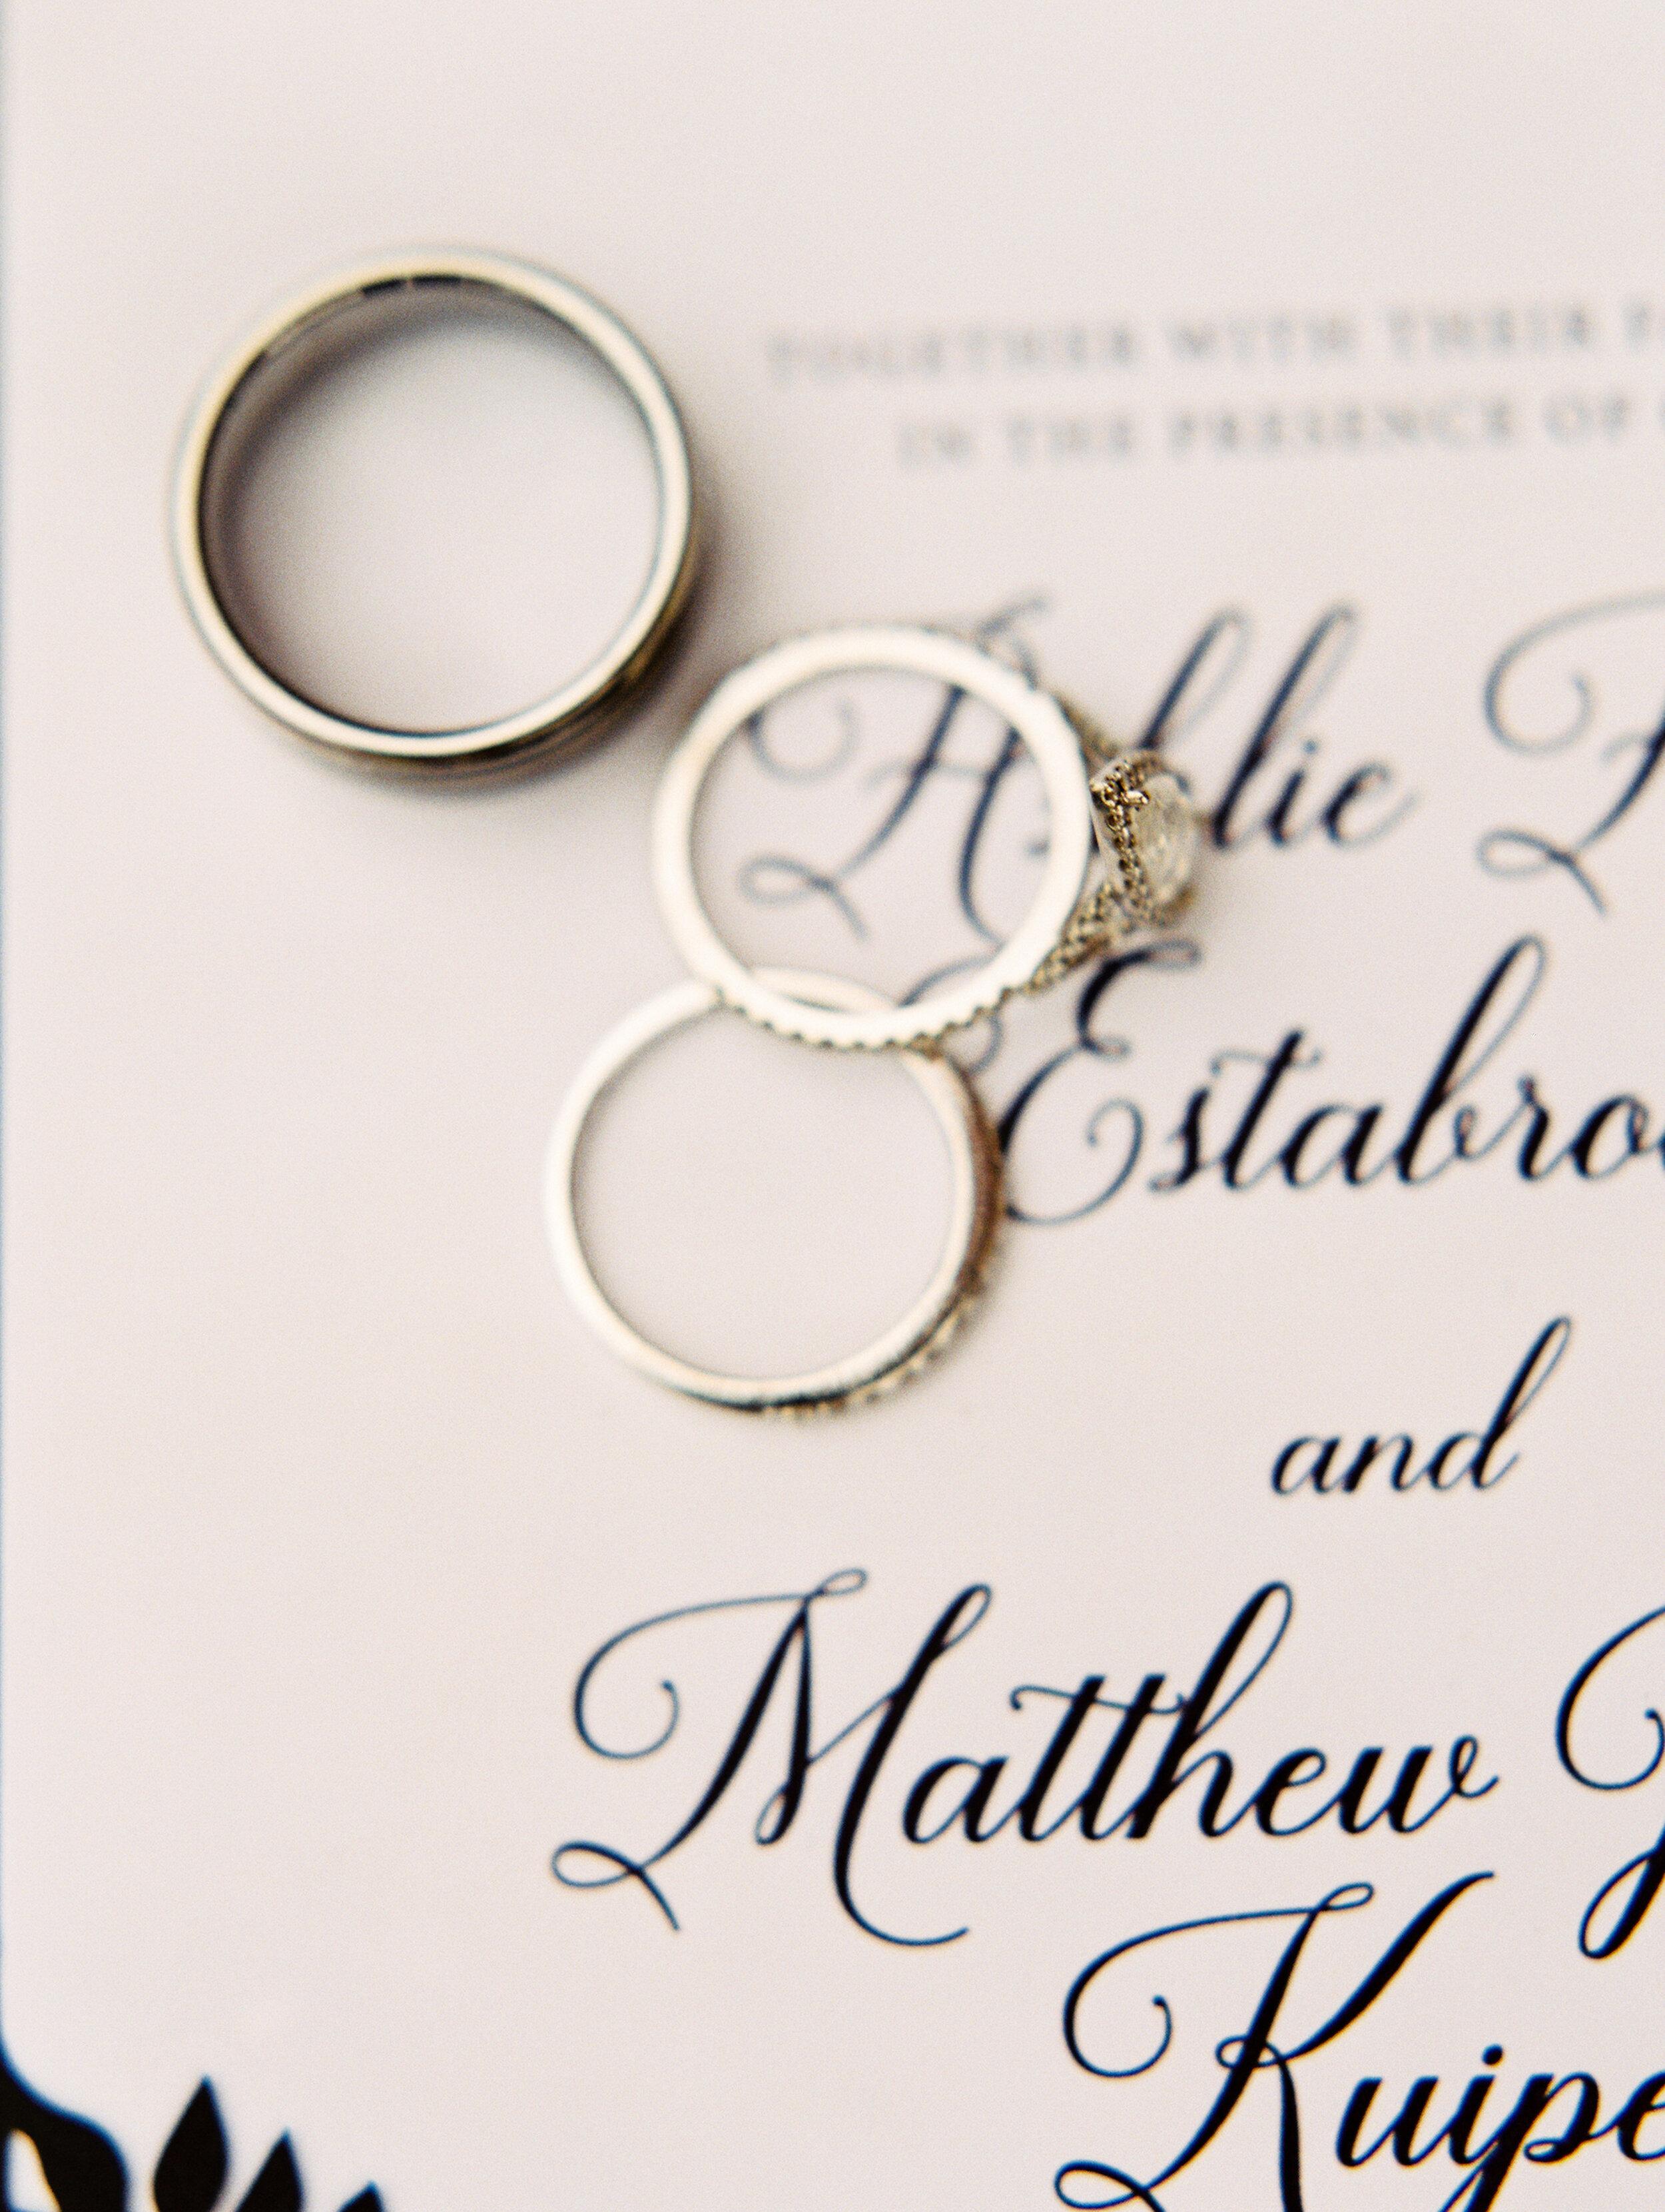 Kuiper+Wedding+Details-24.jpg